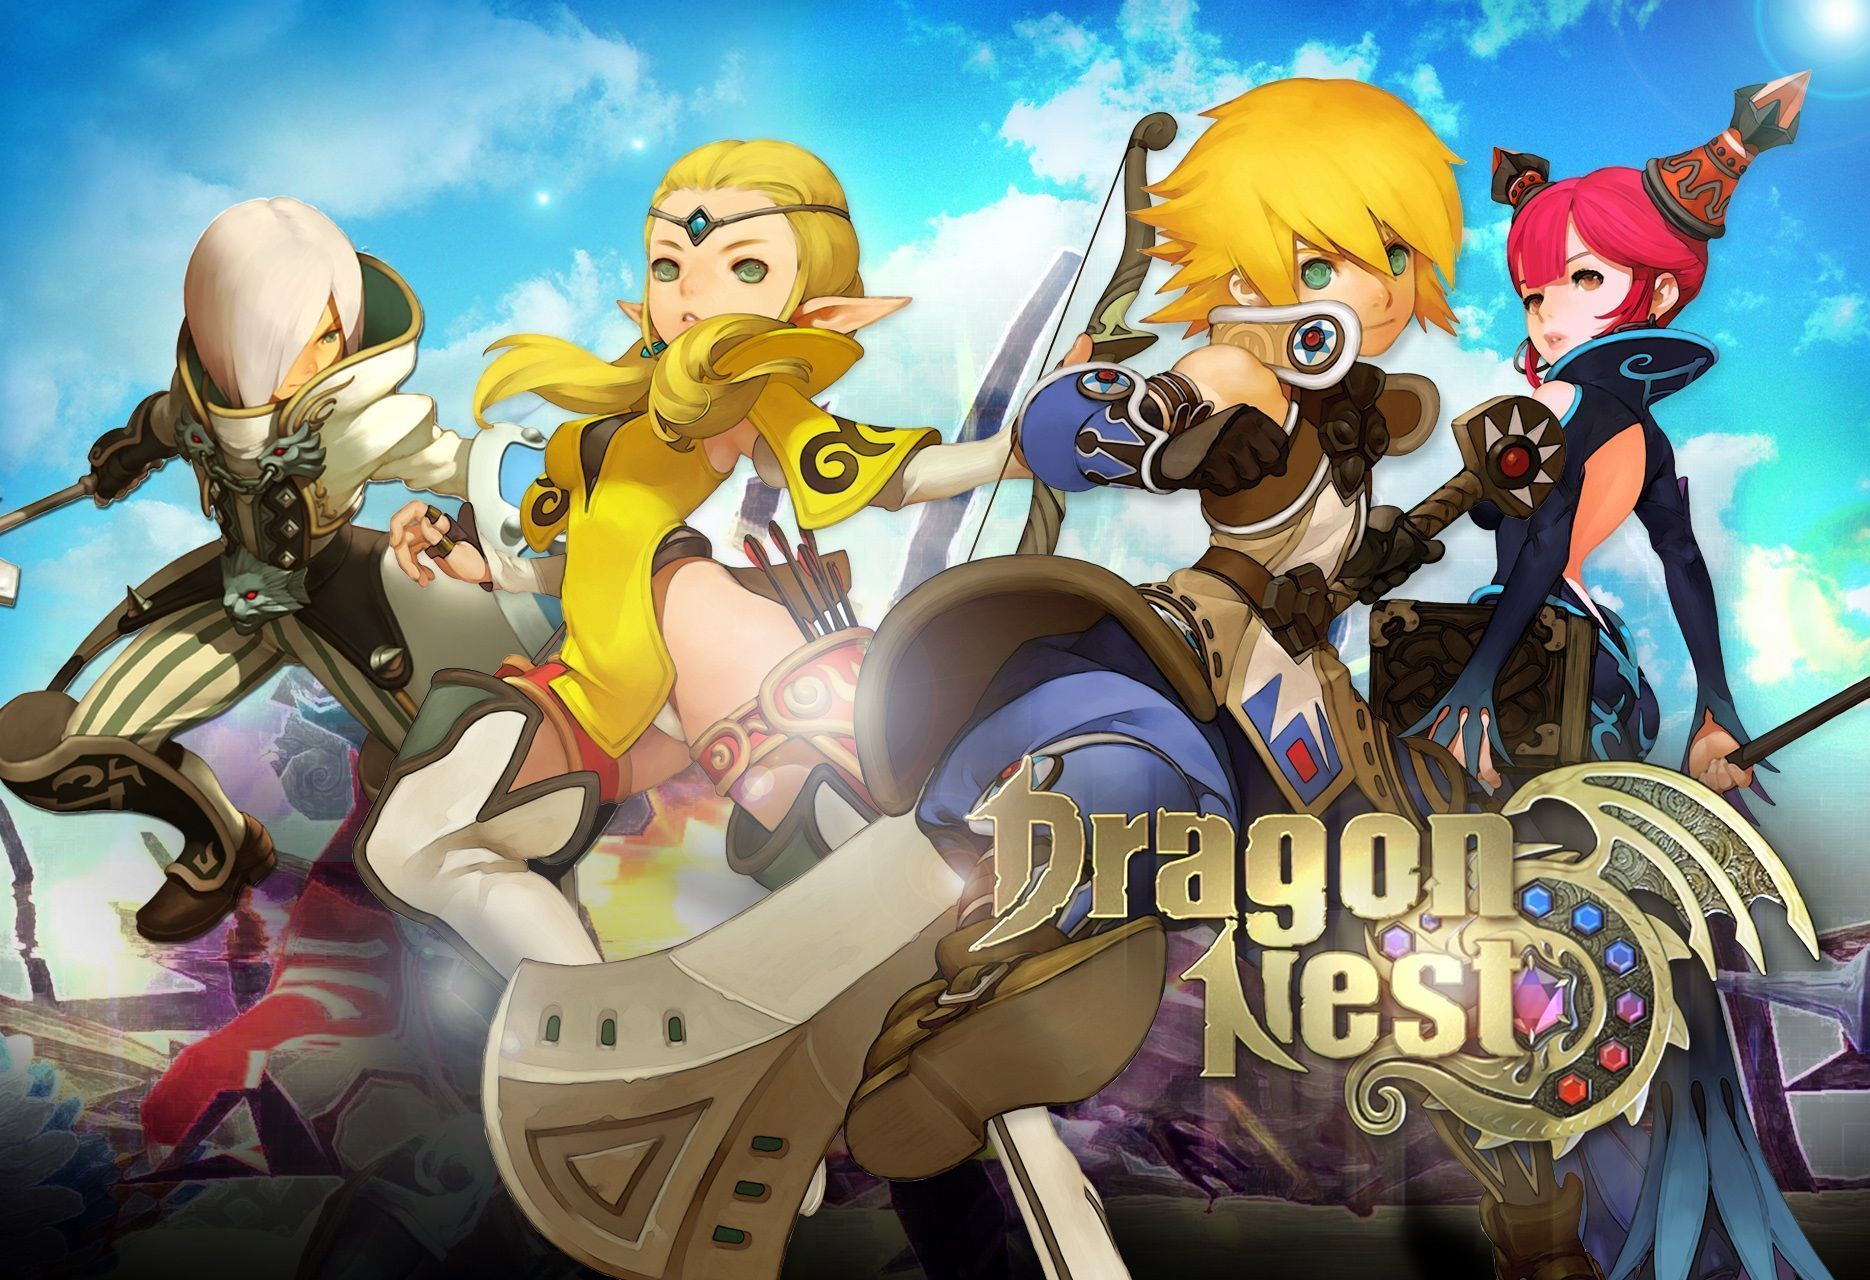 dragon nest wallpaper Android Pinterest